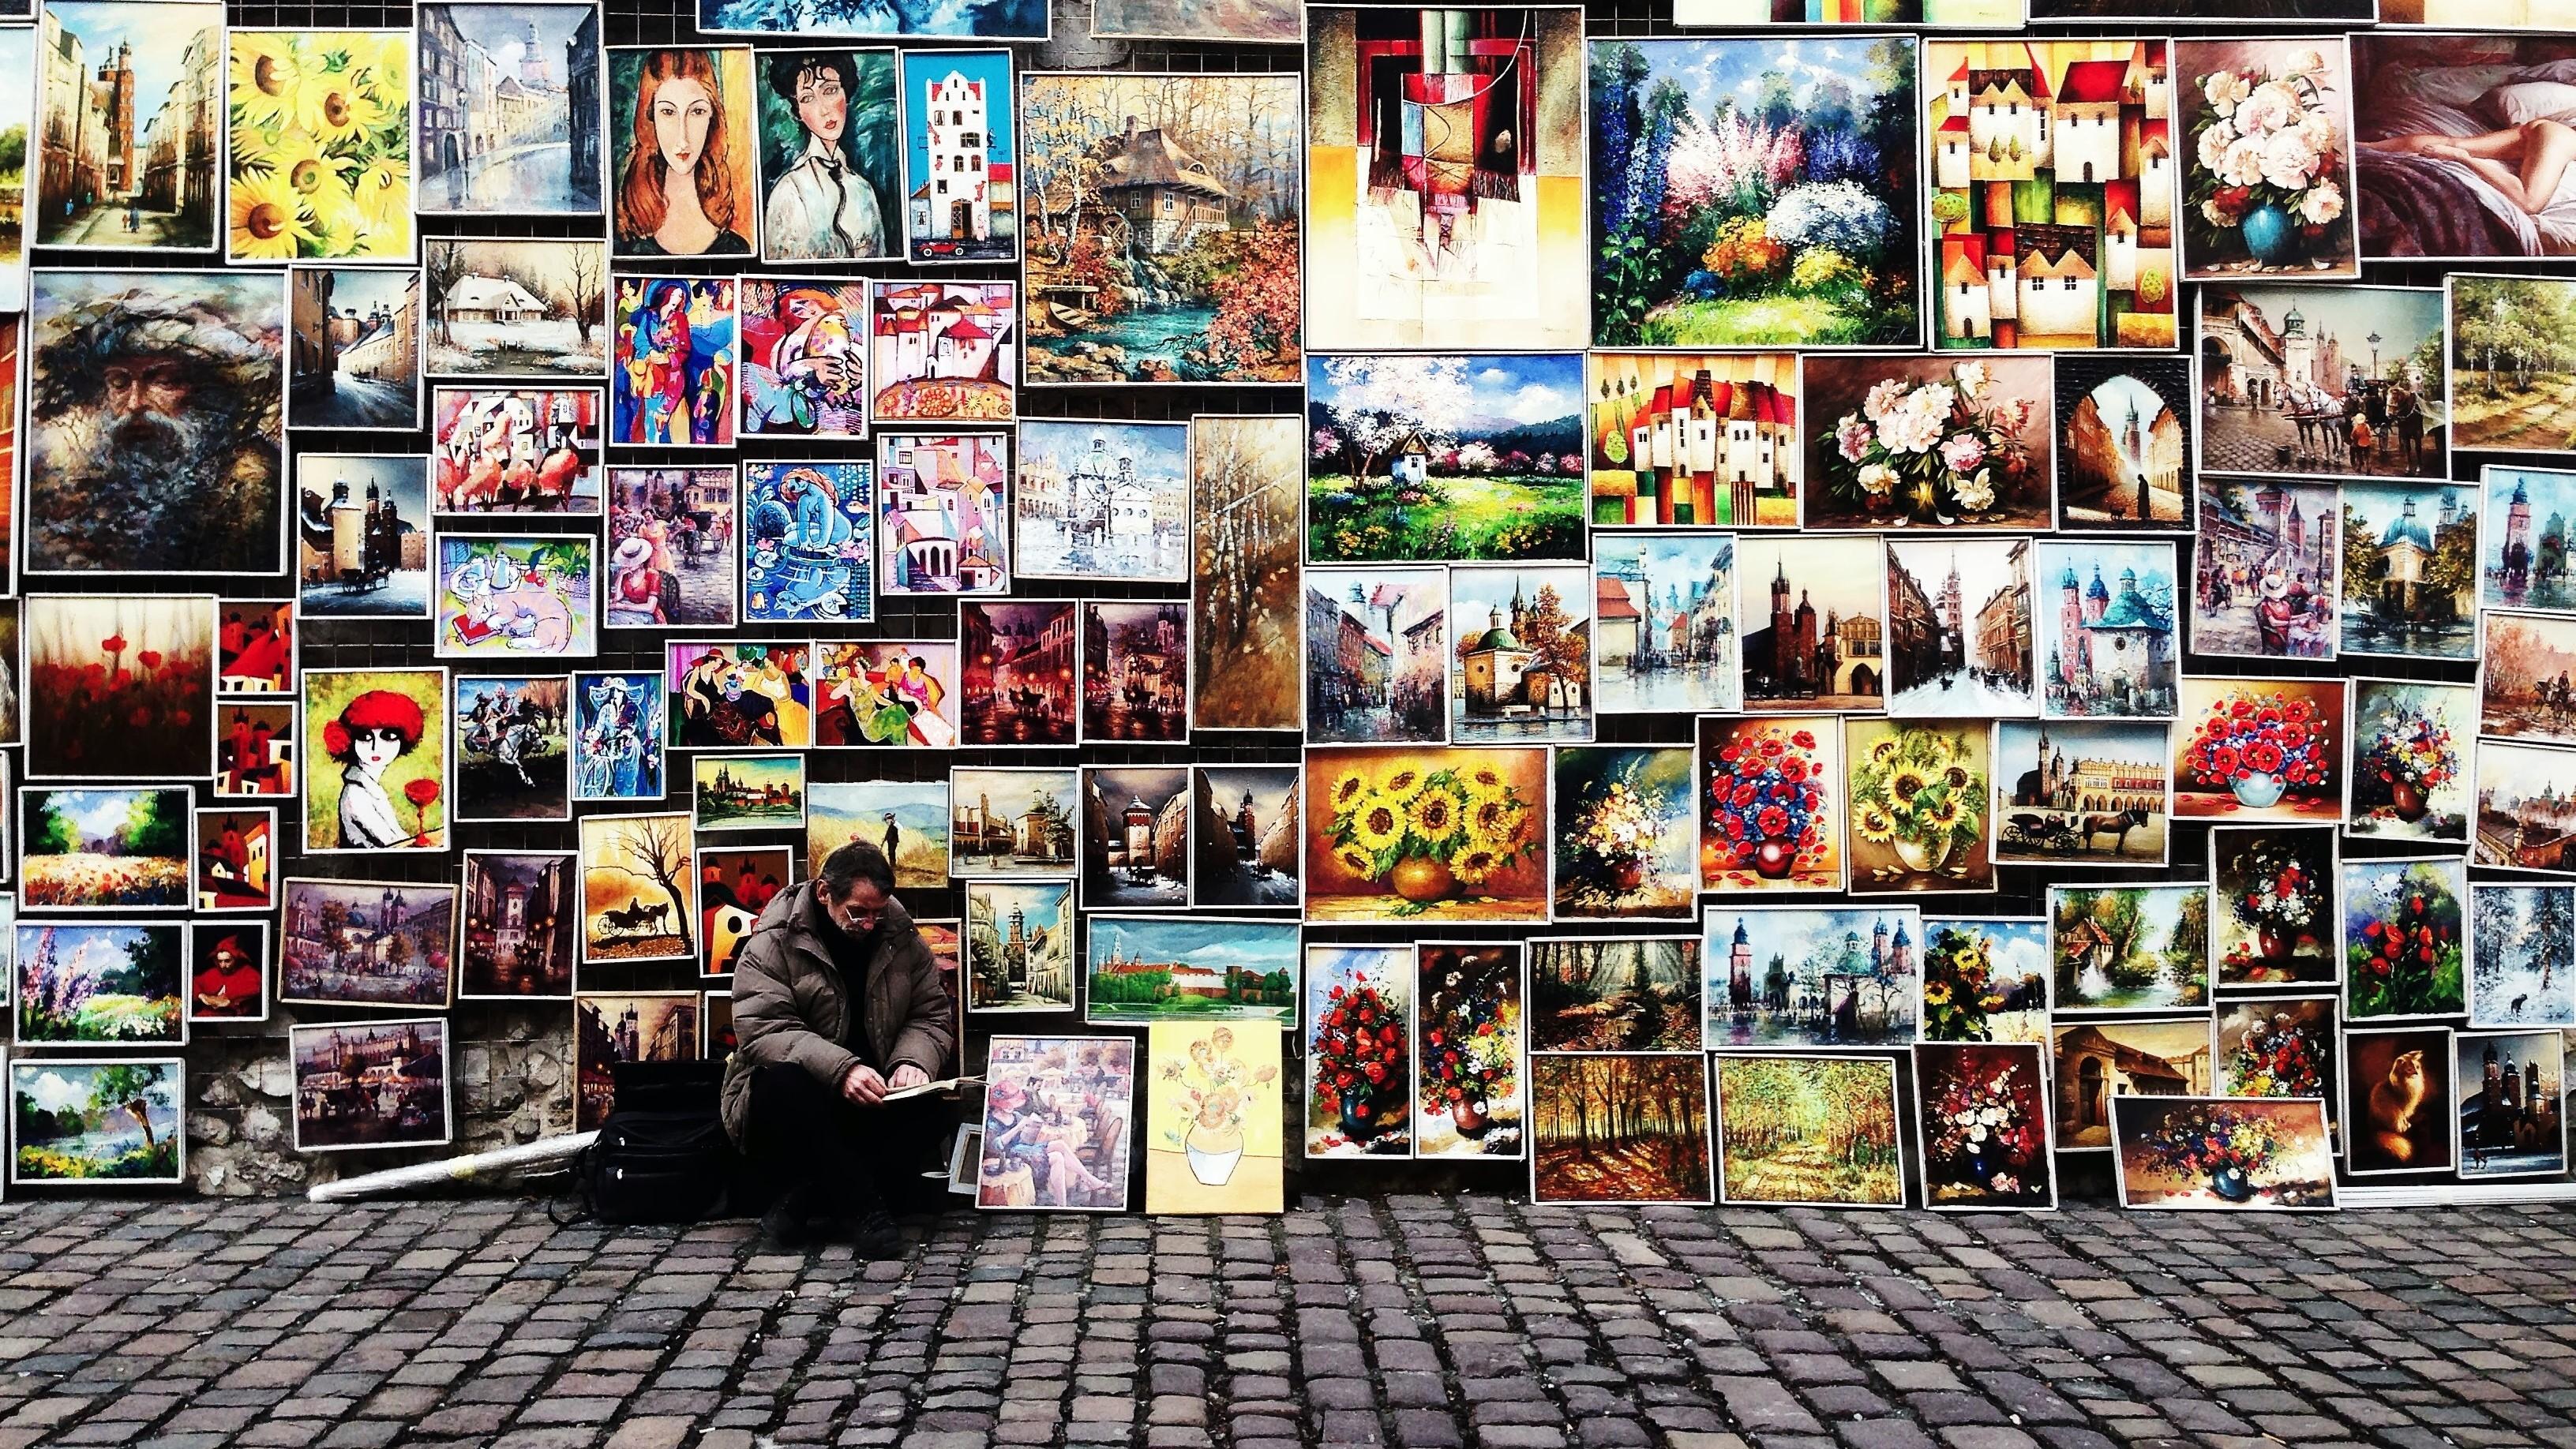 krakow-paintings-culture